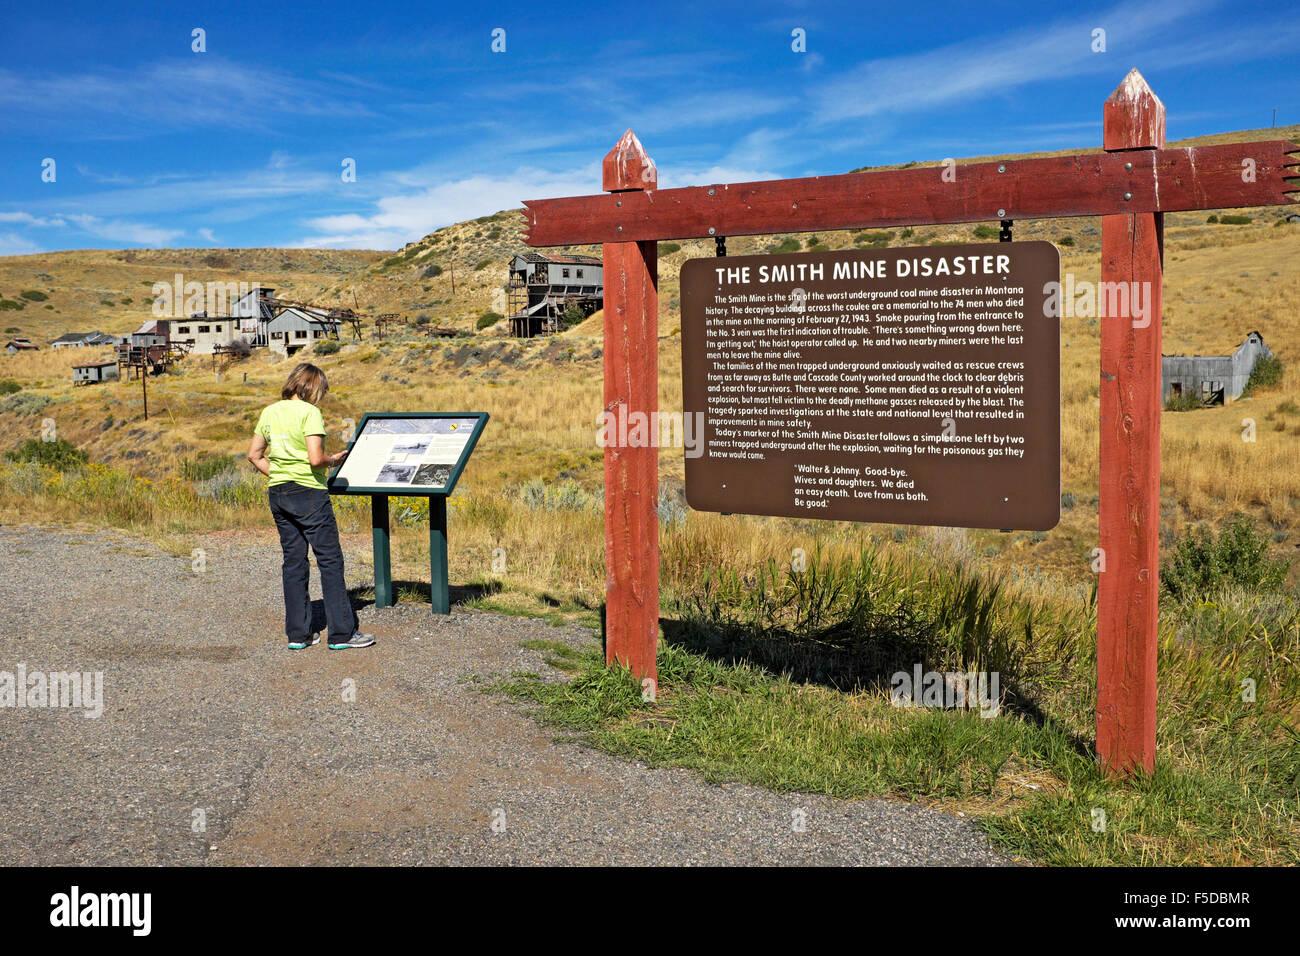 The abandoned Smith Mine, near Red Lodge, Montana, site of Montana's